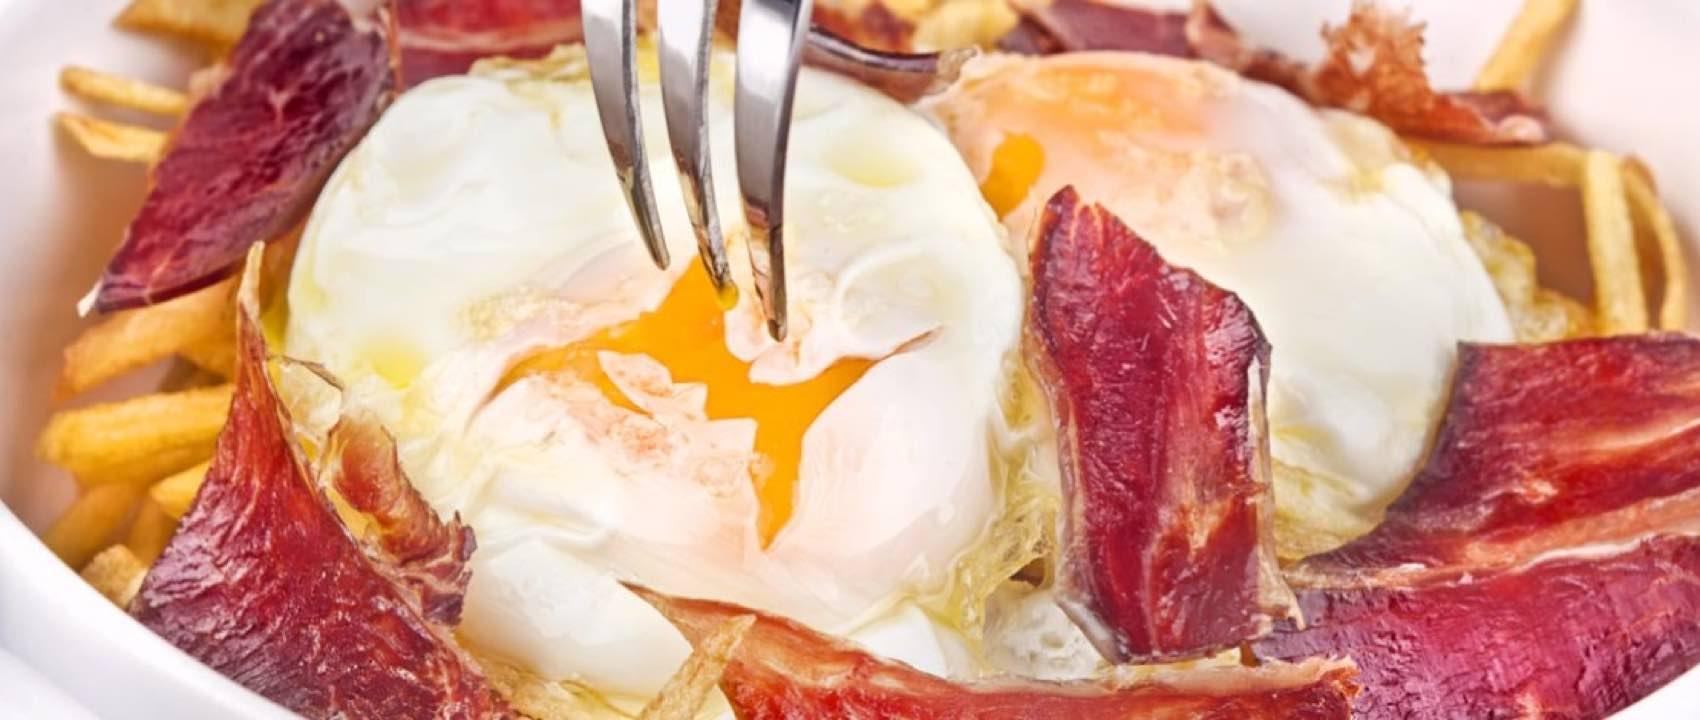 Huevos rotos er en spansk spesialitet